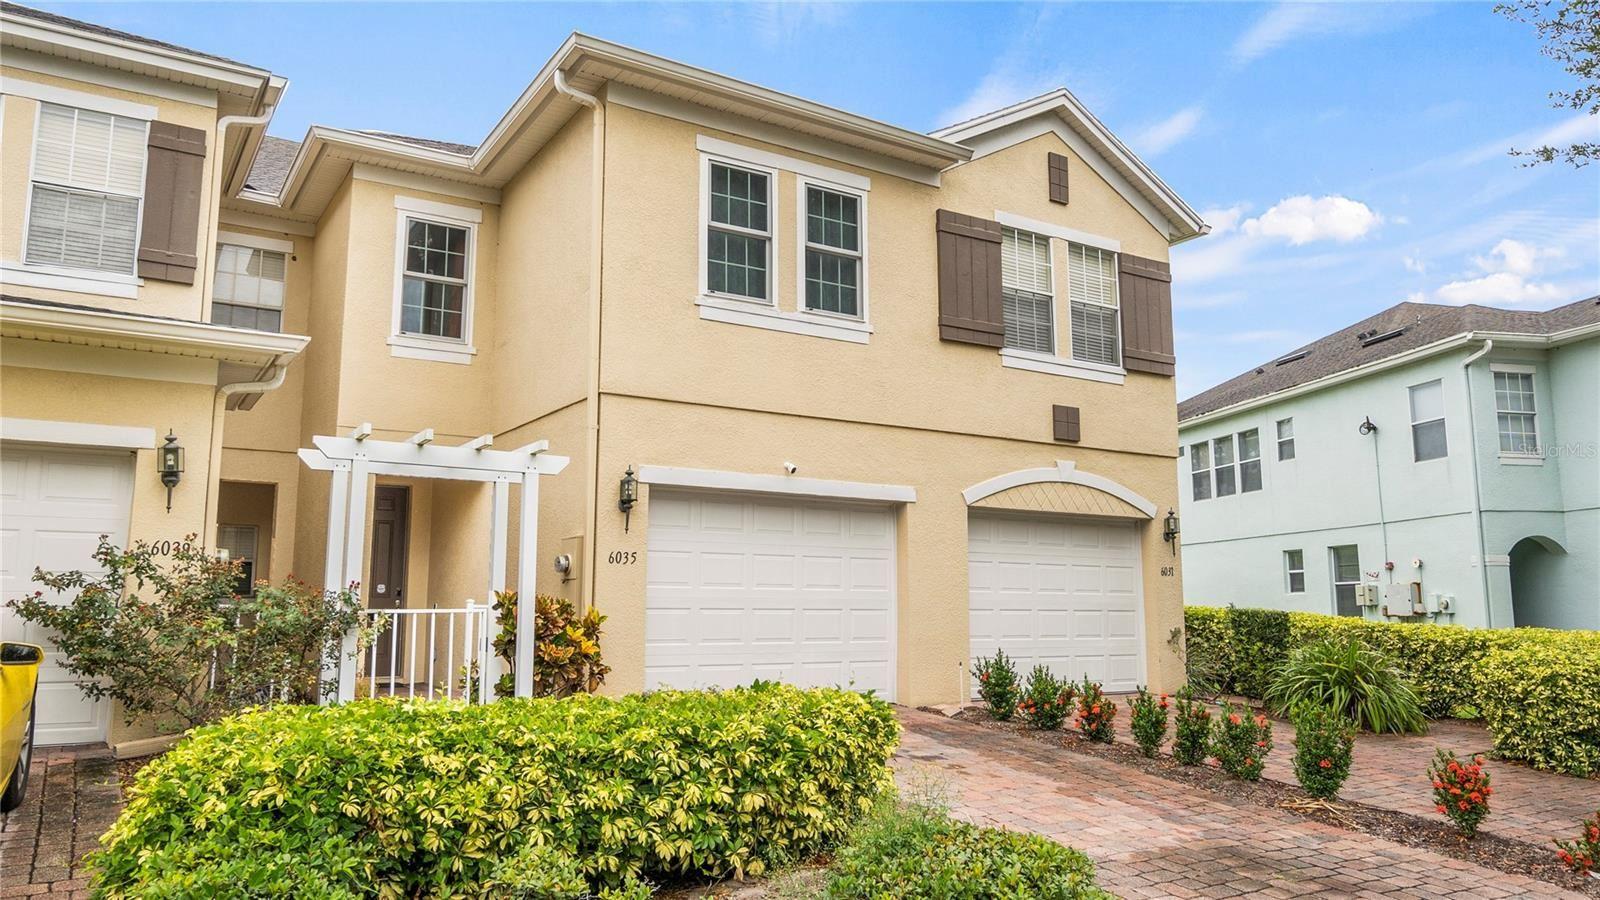 6035 STRADA ISLE WAY, Orlando, FL 32835 - MLS#: S5054540